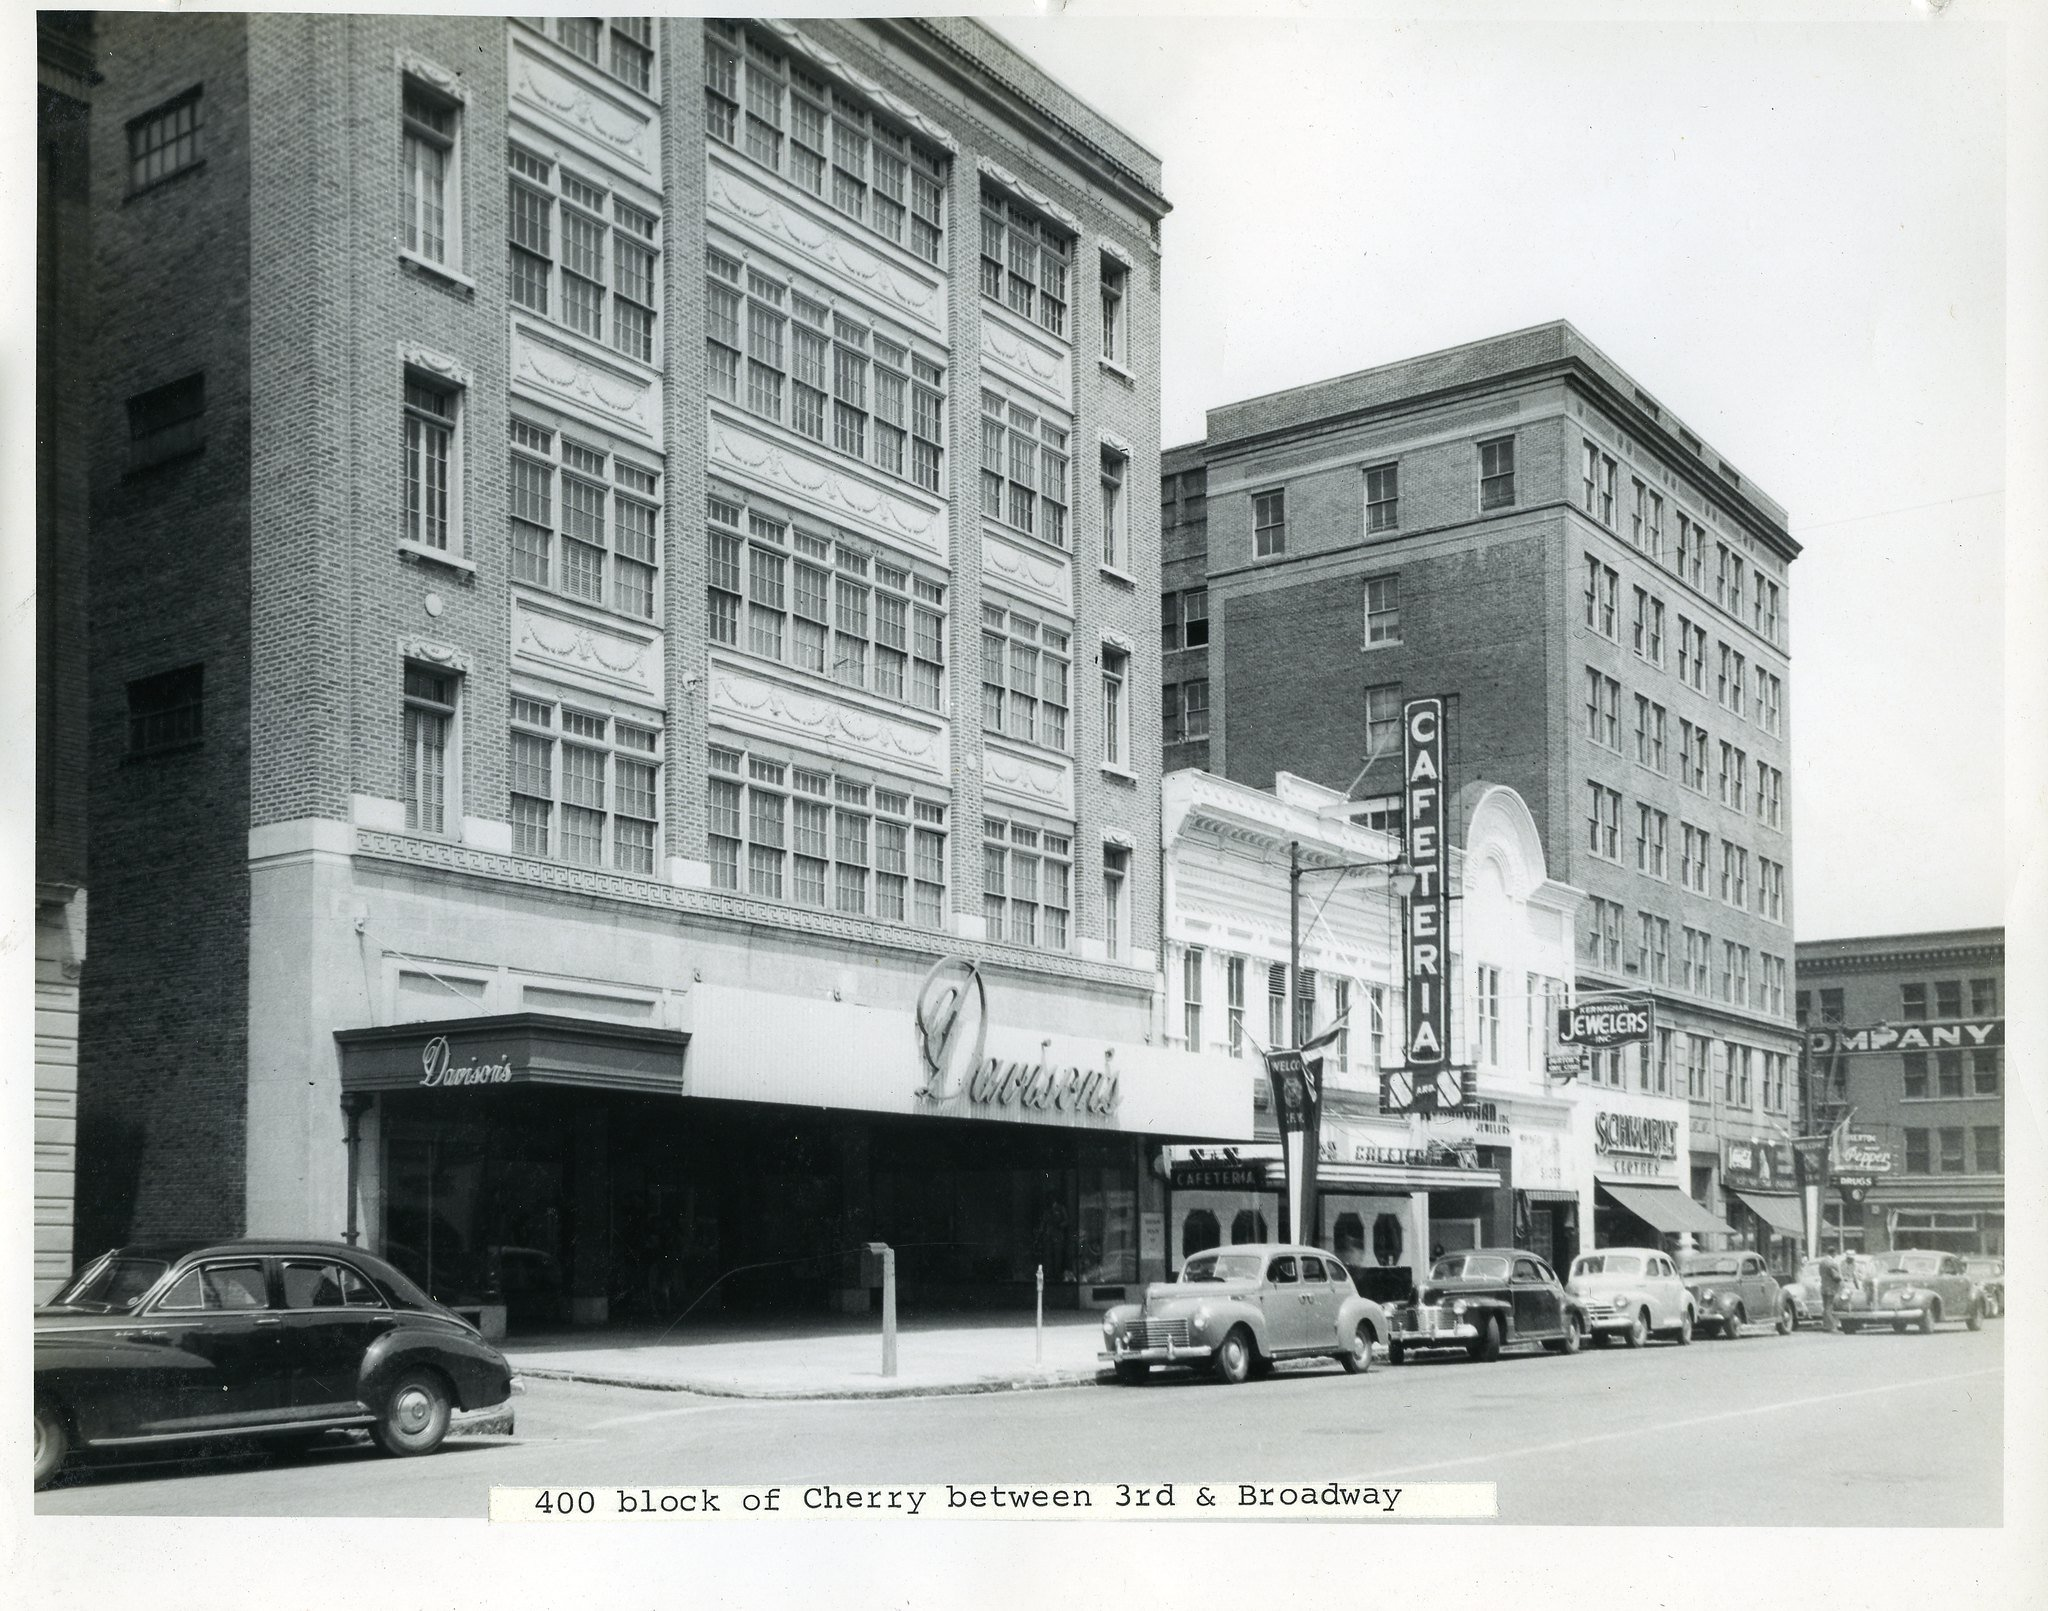 415 Cherry Street Historic Photo